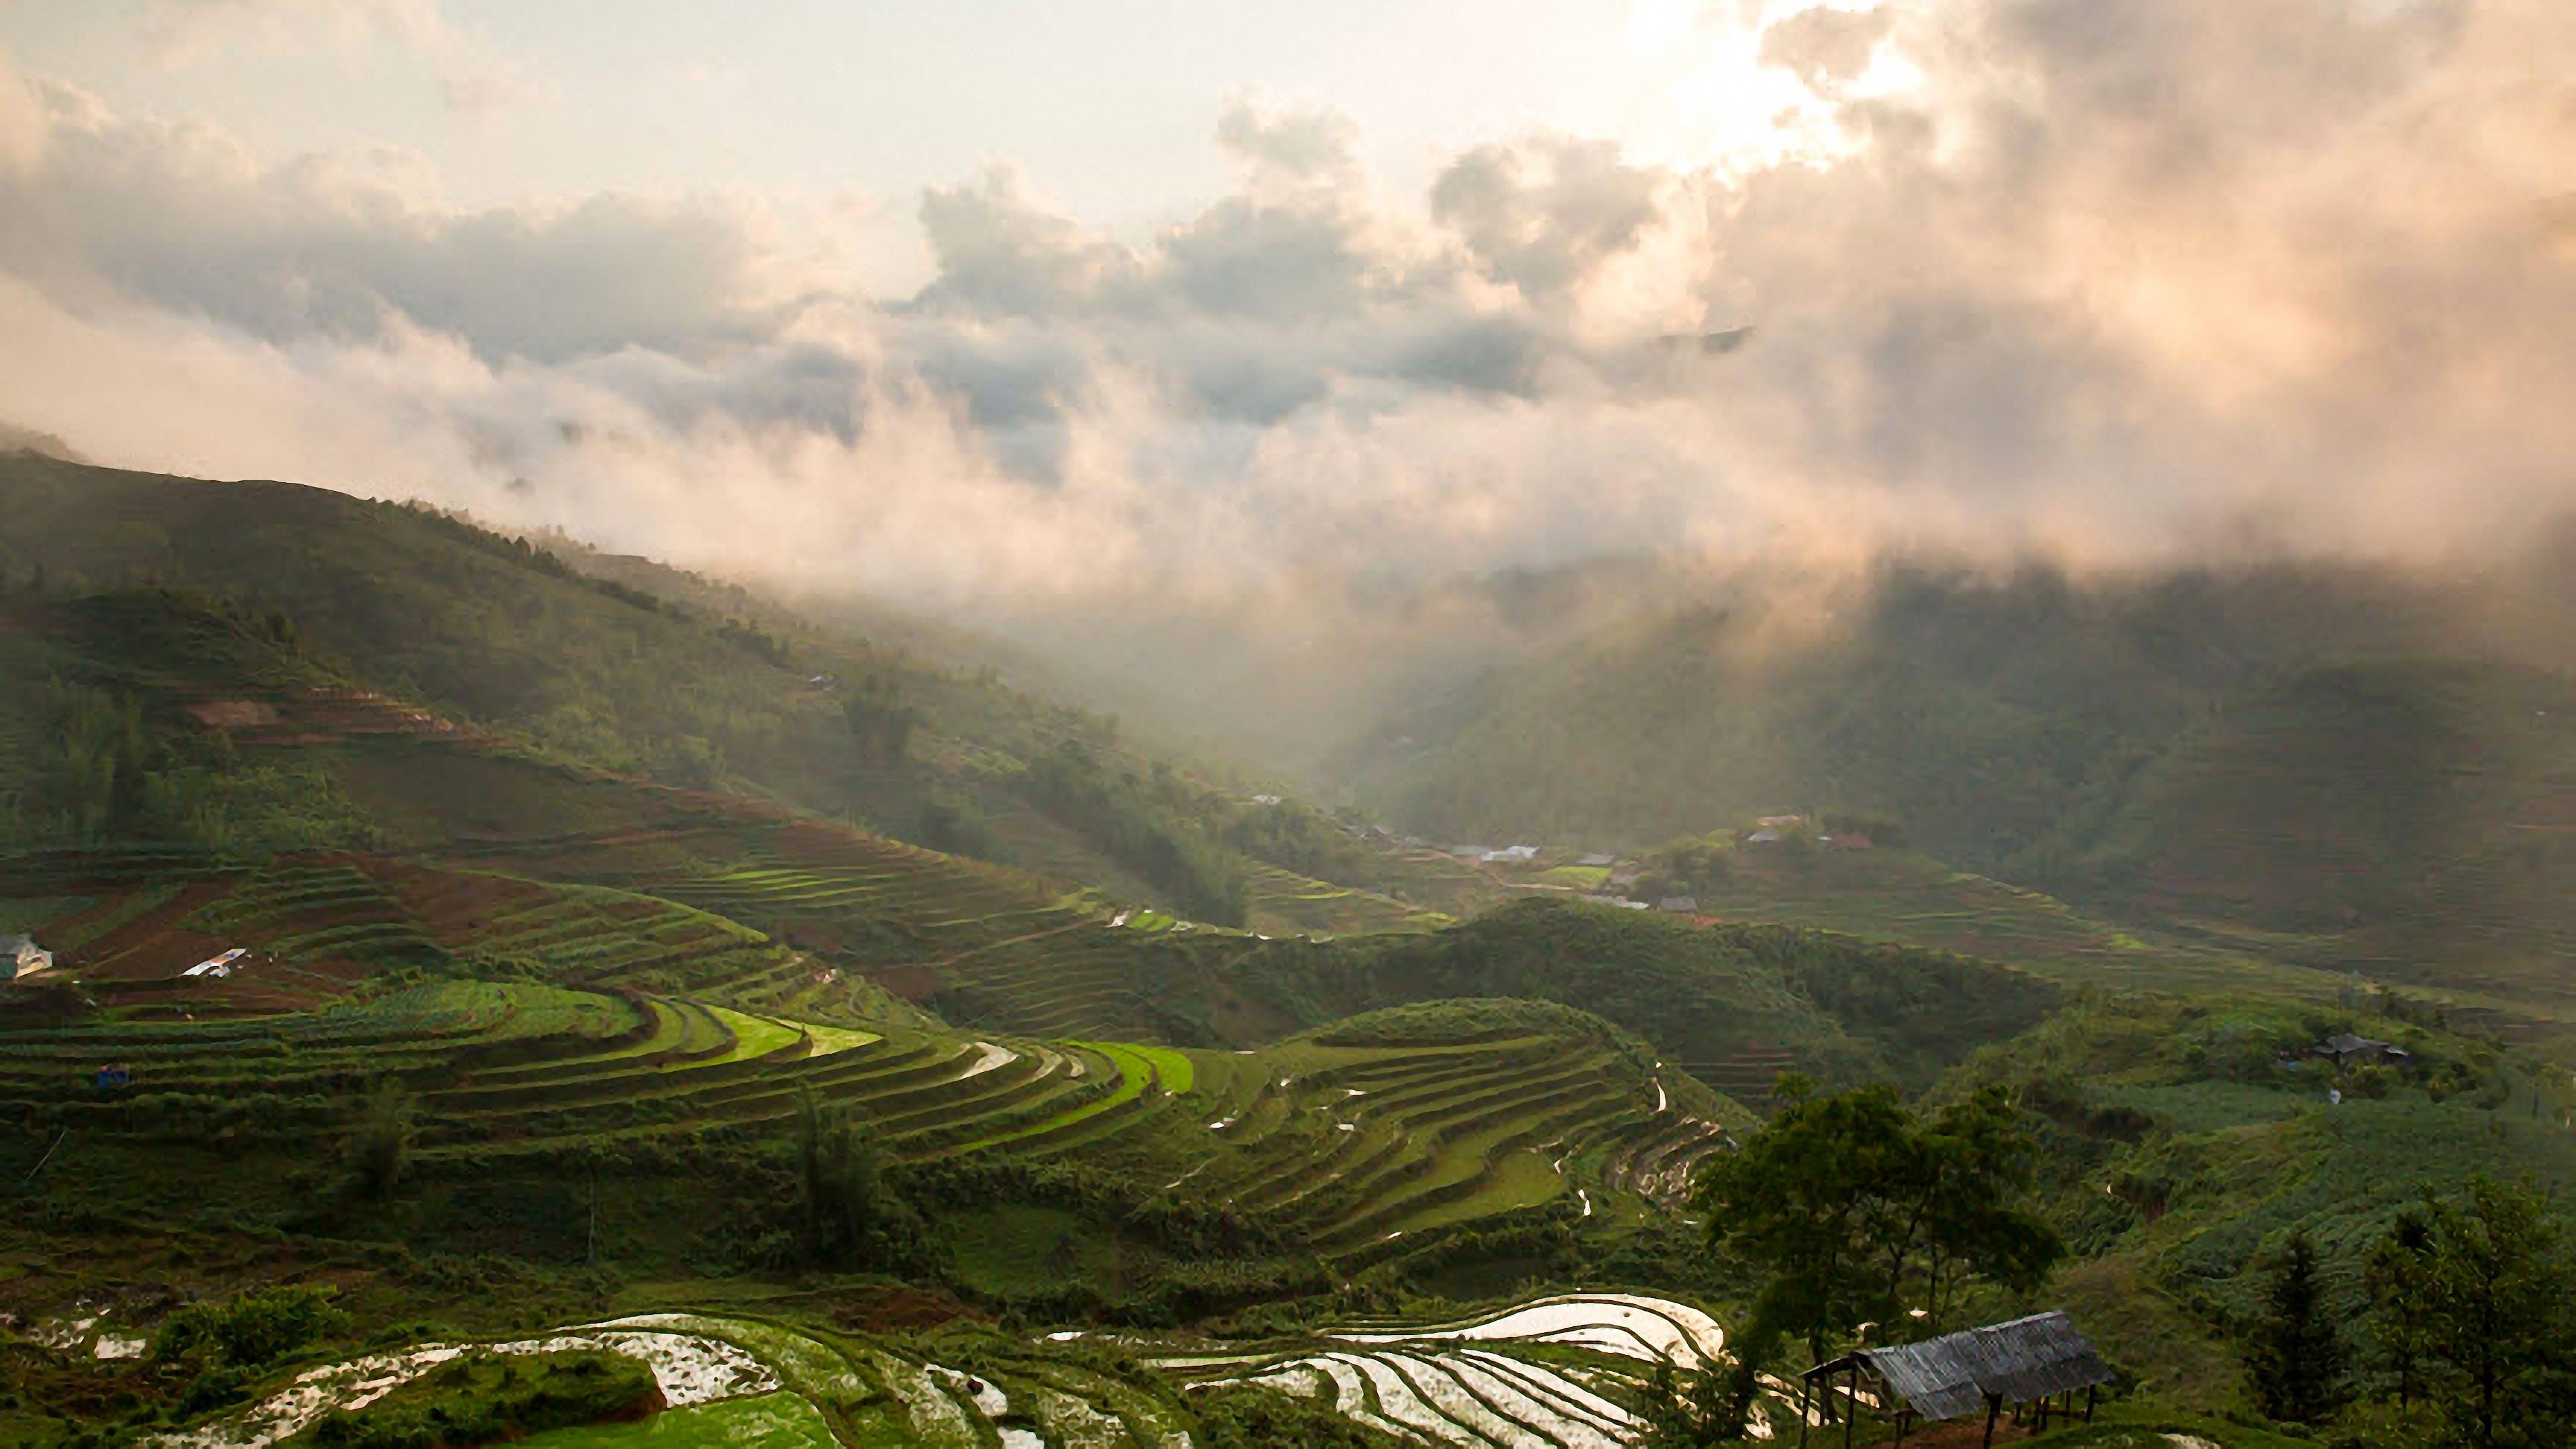 amanecer, campos de cultivo, colina